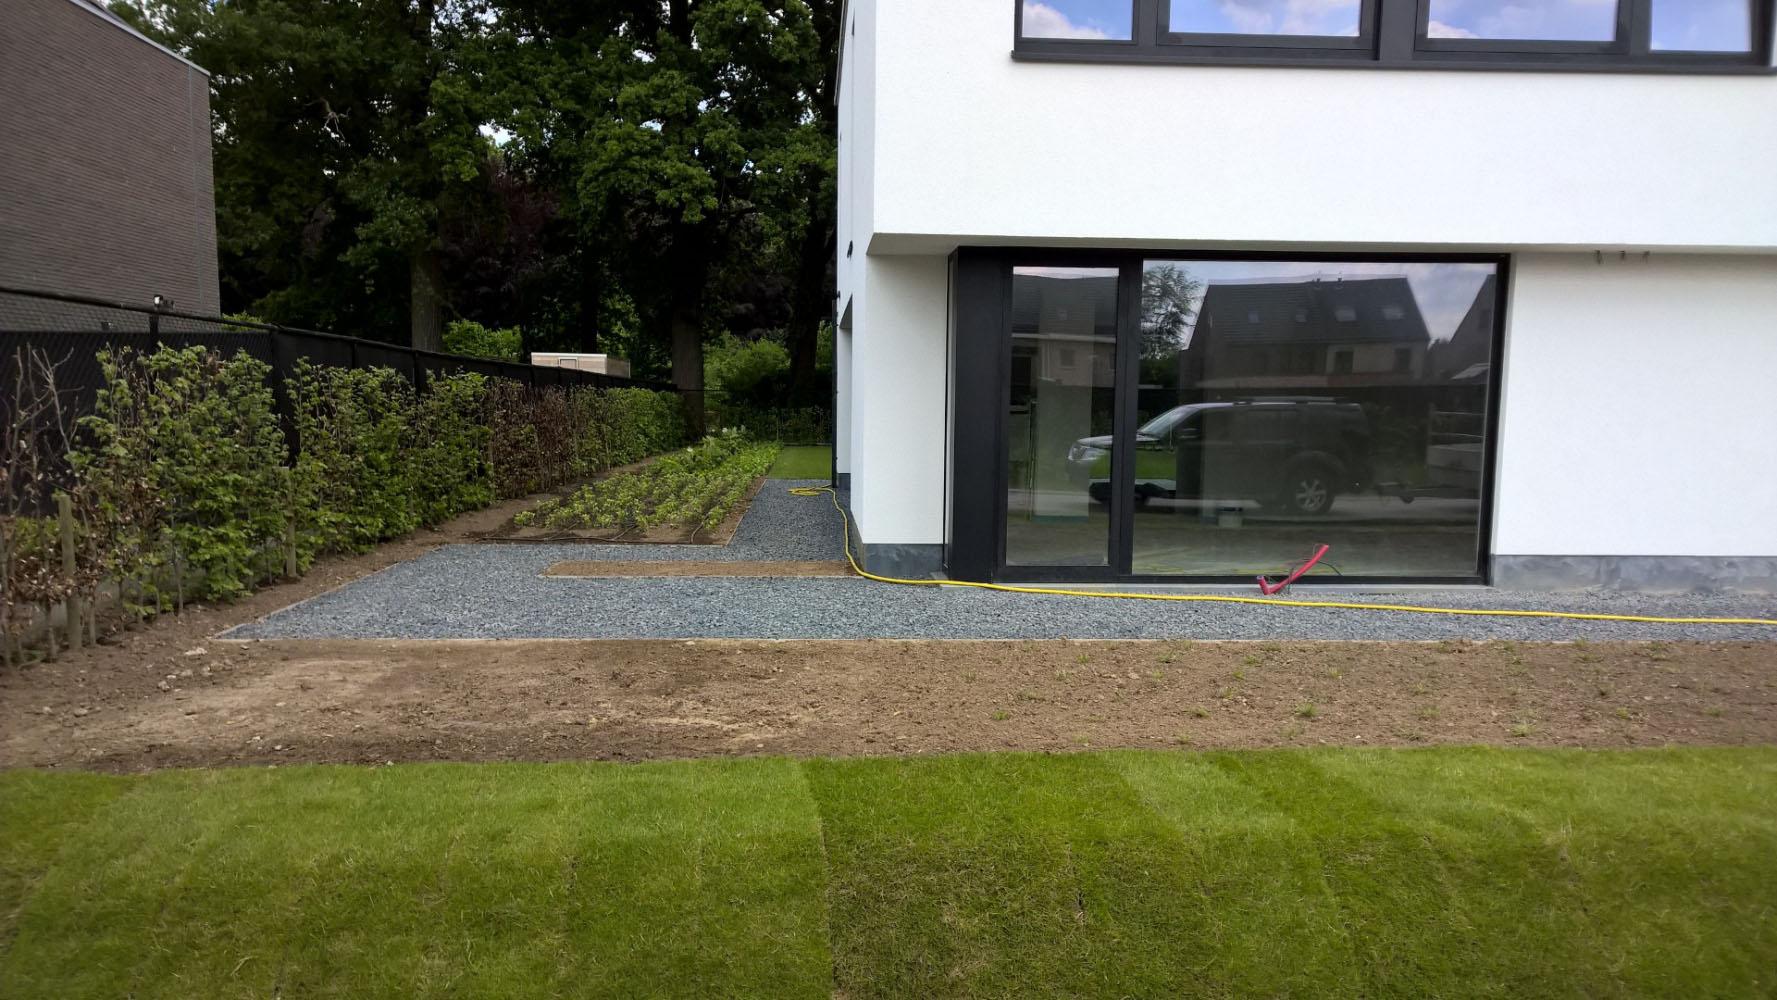 Moderne tuin laten aanleggen moderne tuinen voorbeelden tuin modern - Moderne tuinfoto ...